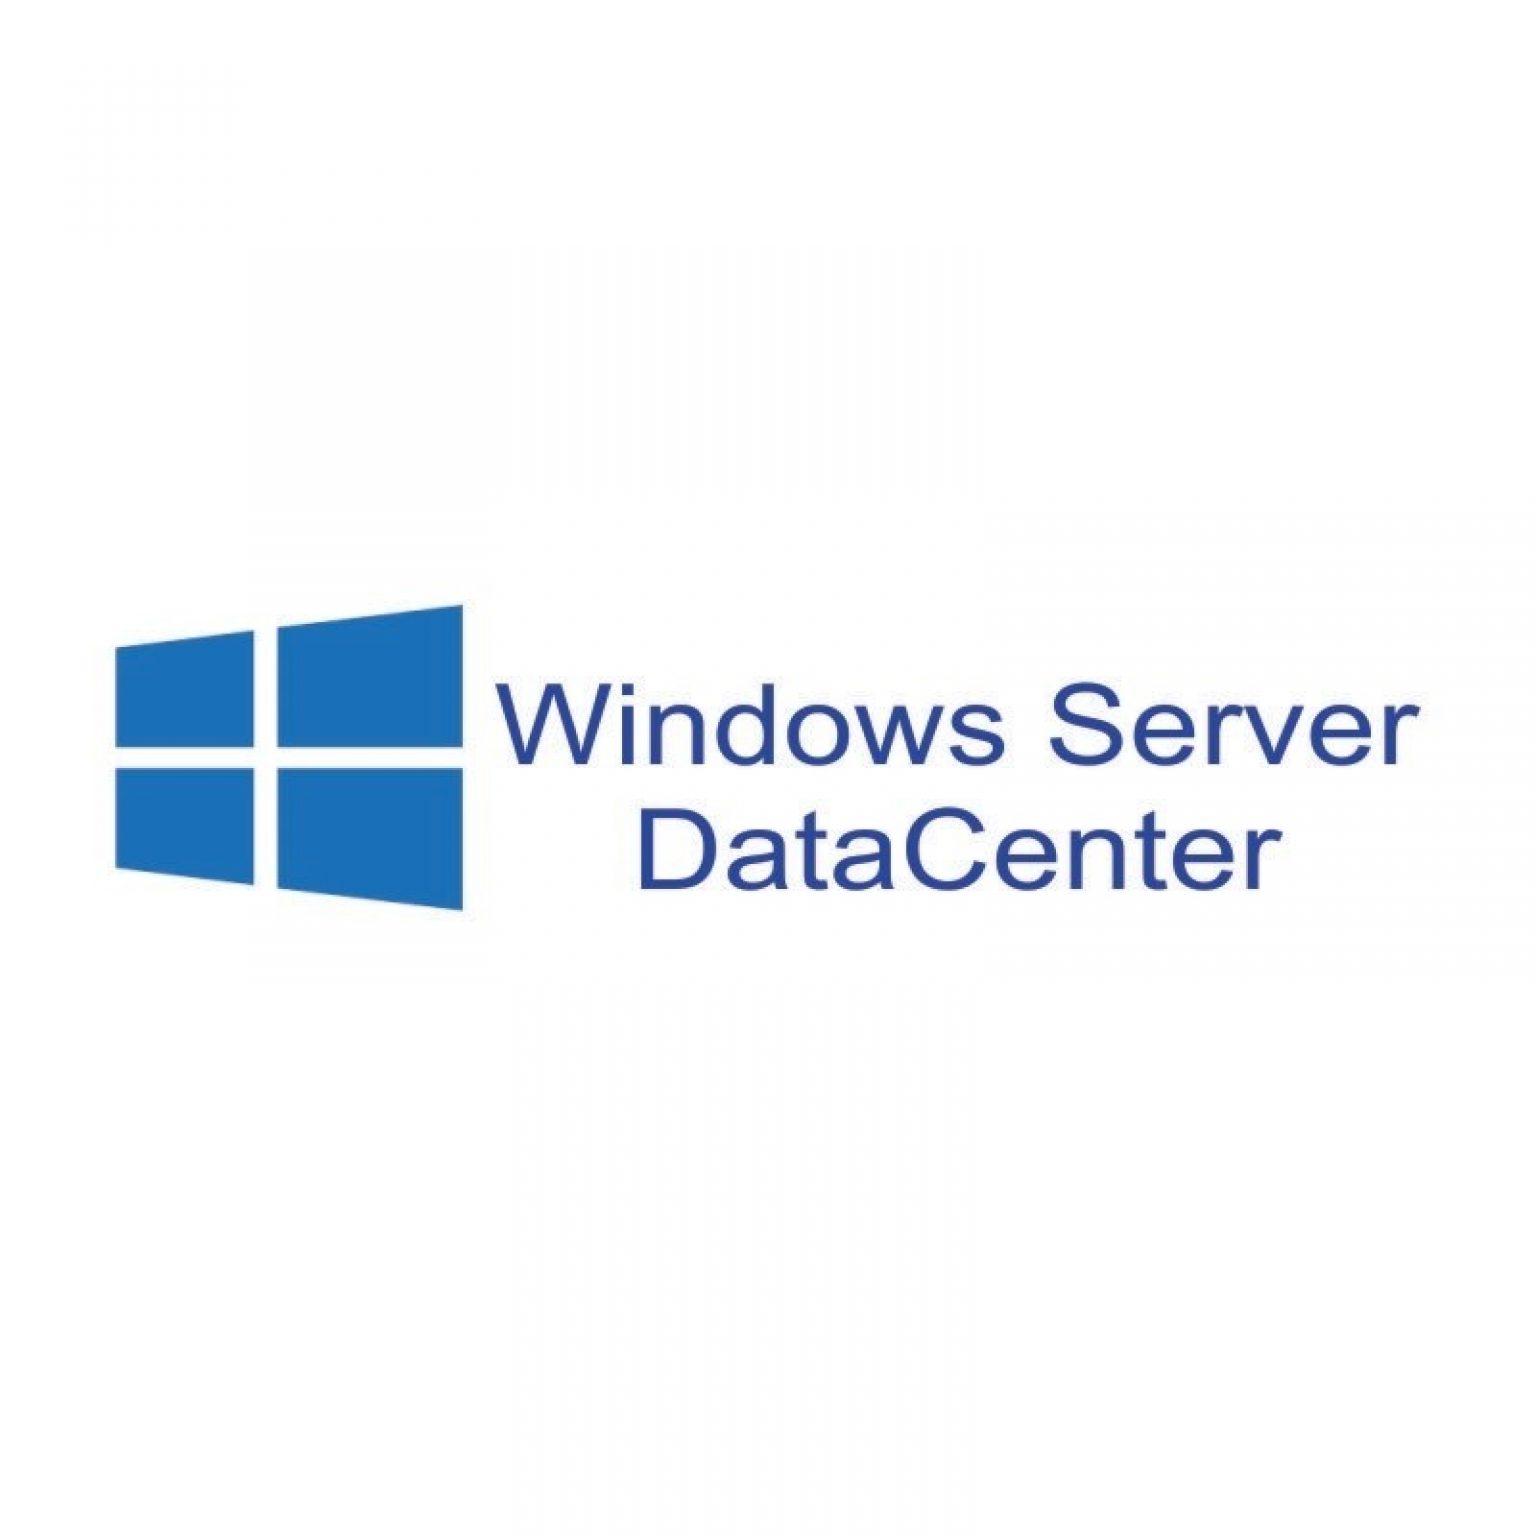 MICROSOFT - [Windows Server DC Core]WinSvrDCCore ALNG LicSAPk OLV 16Lic E 1Y Acdmc AP CoreLic[Pendidikan]